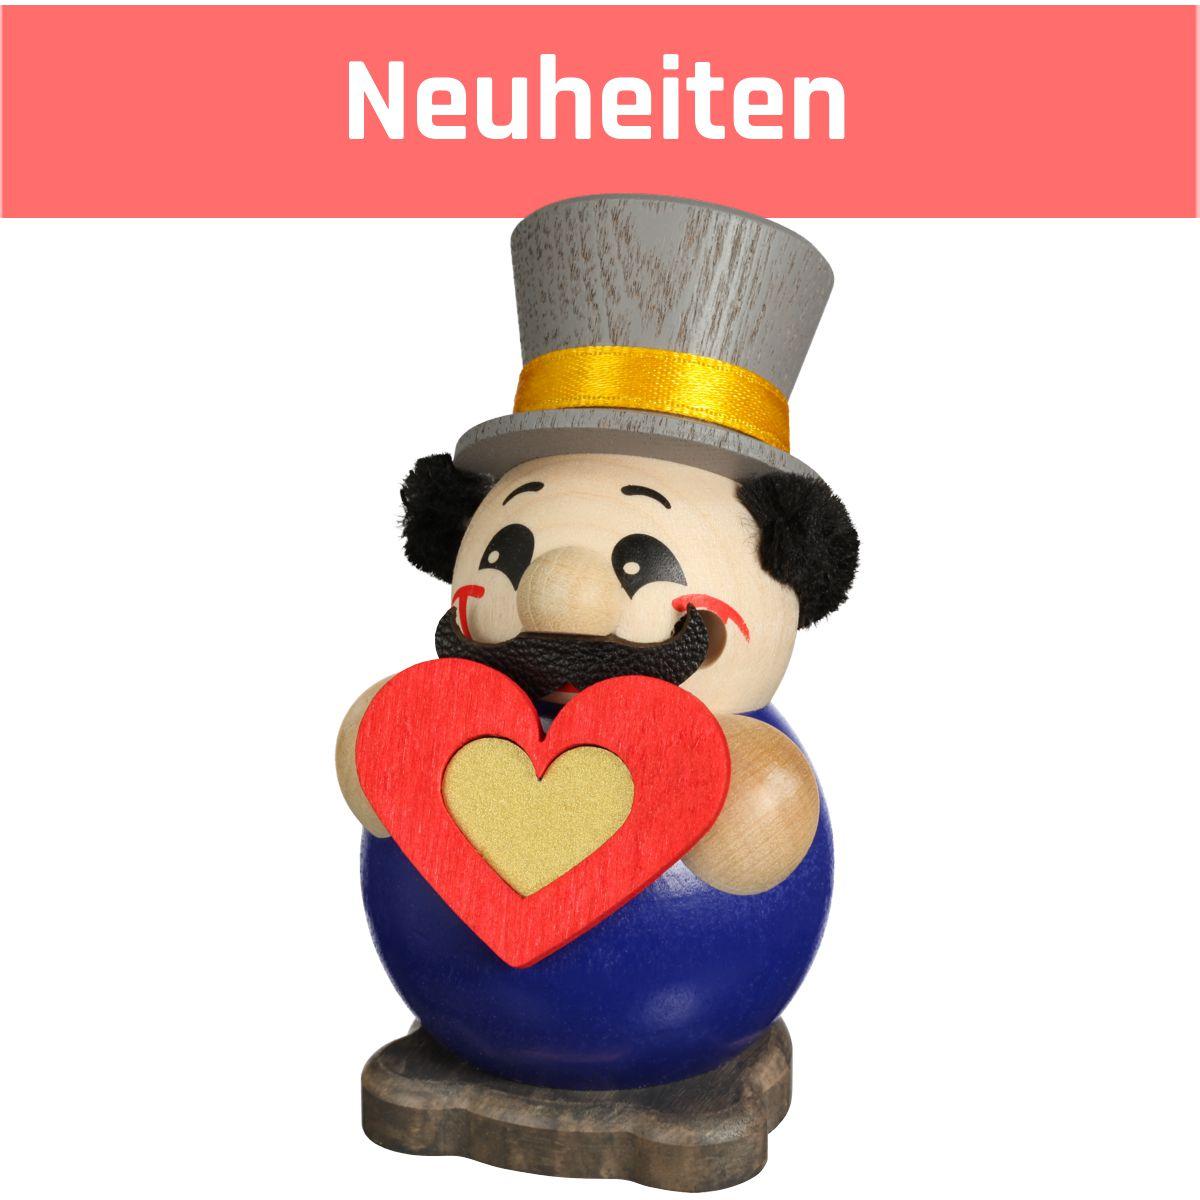 Kugelräucherfigur Höhe 10 cm inkl. 20 Räucherkerzen Fire of Love